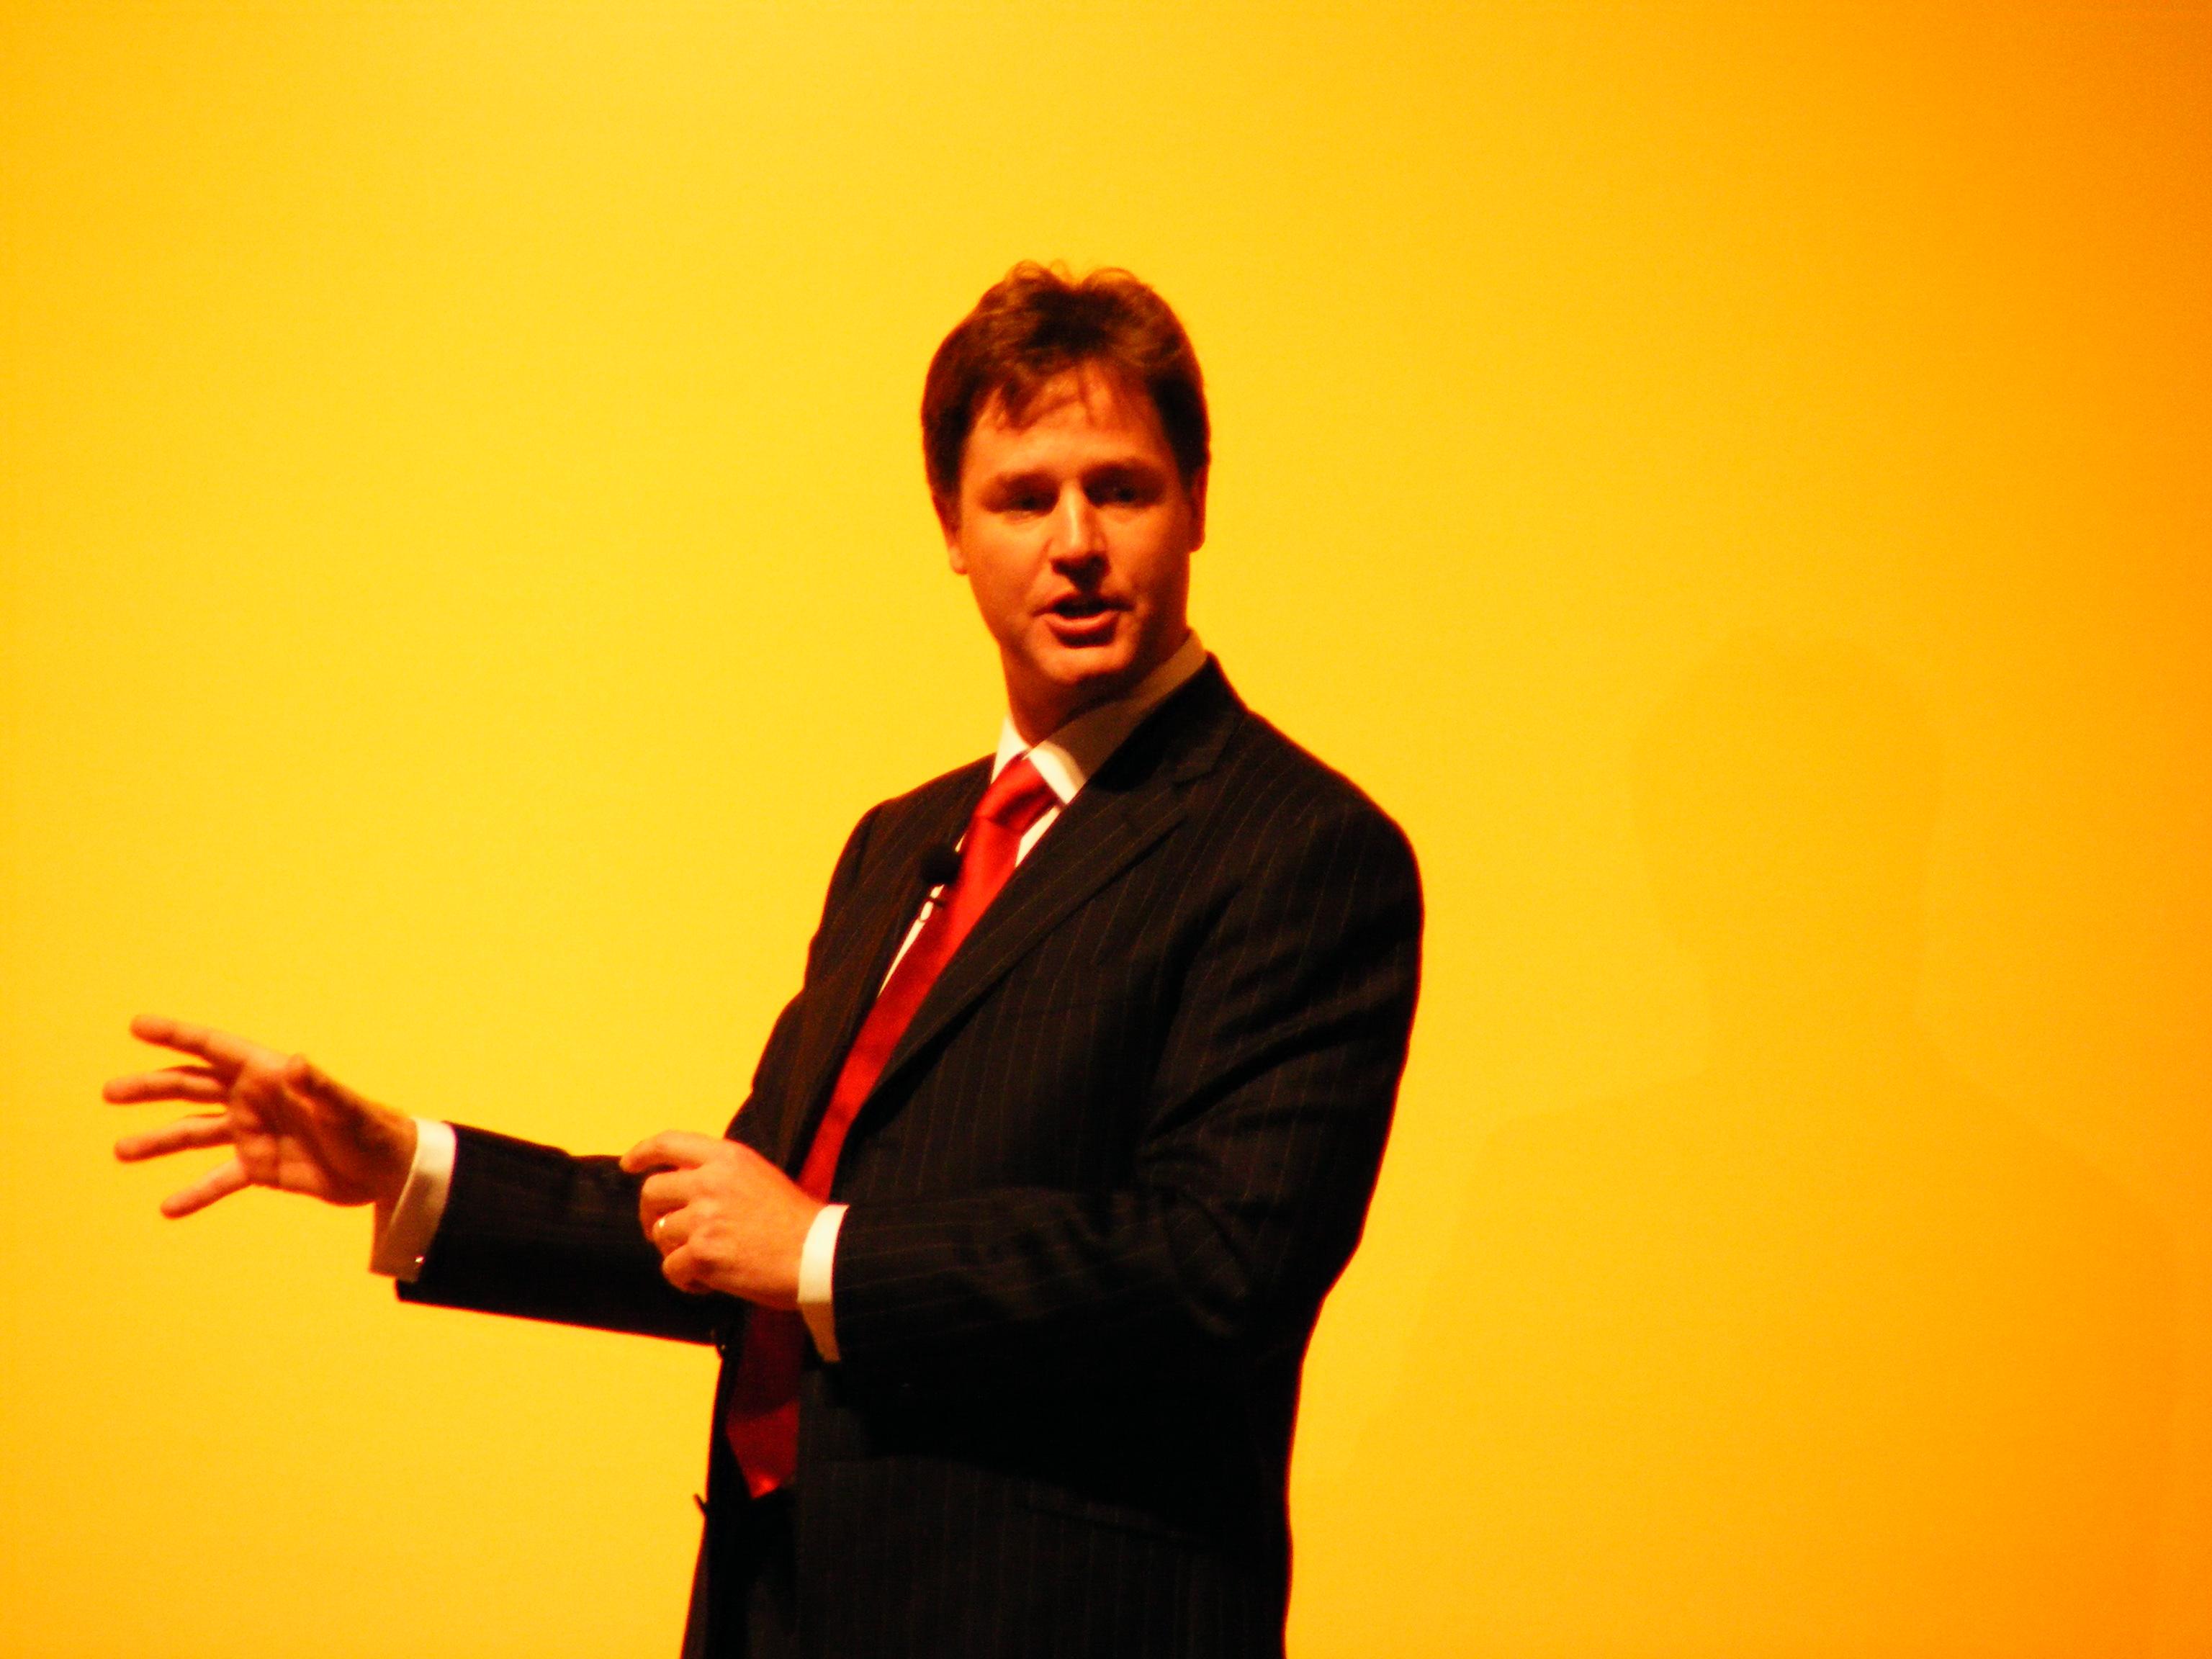 Nick Clegg photo #95196, Nick Clegg image